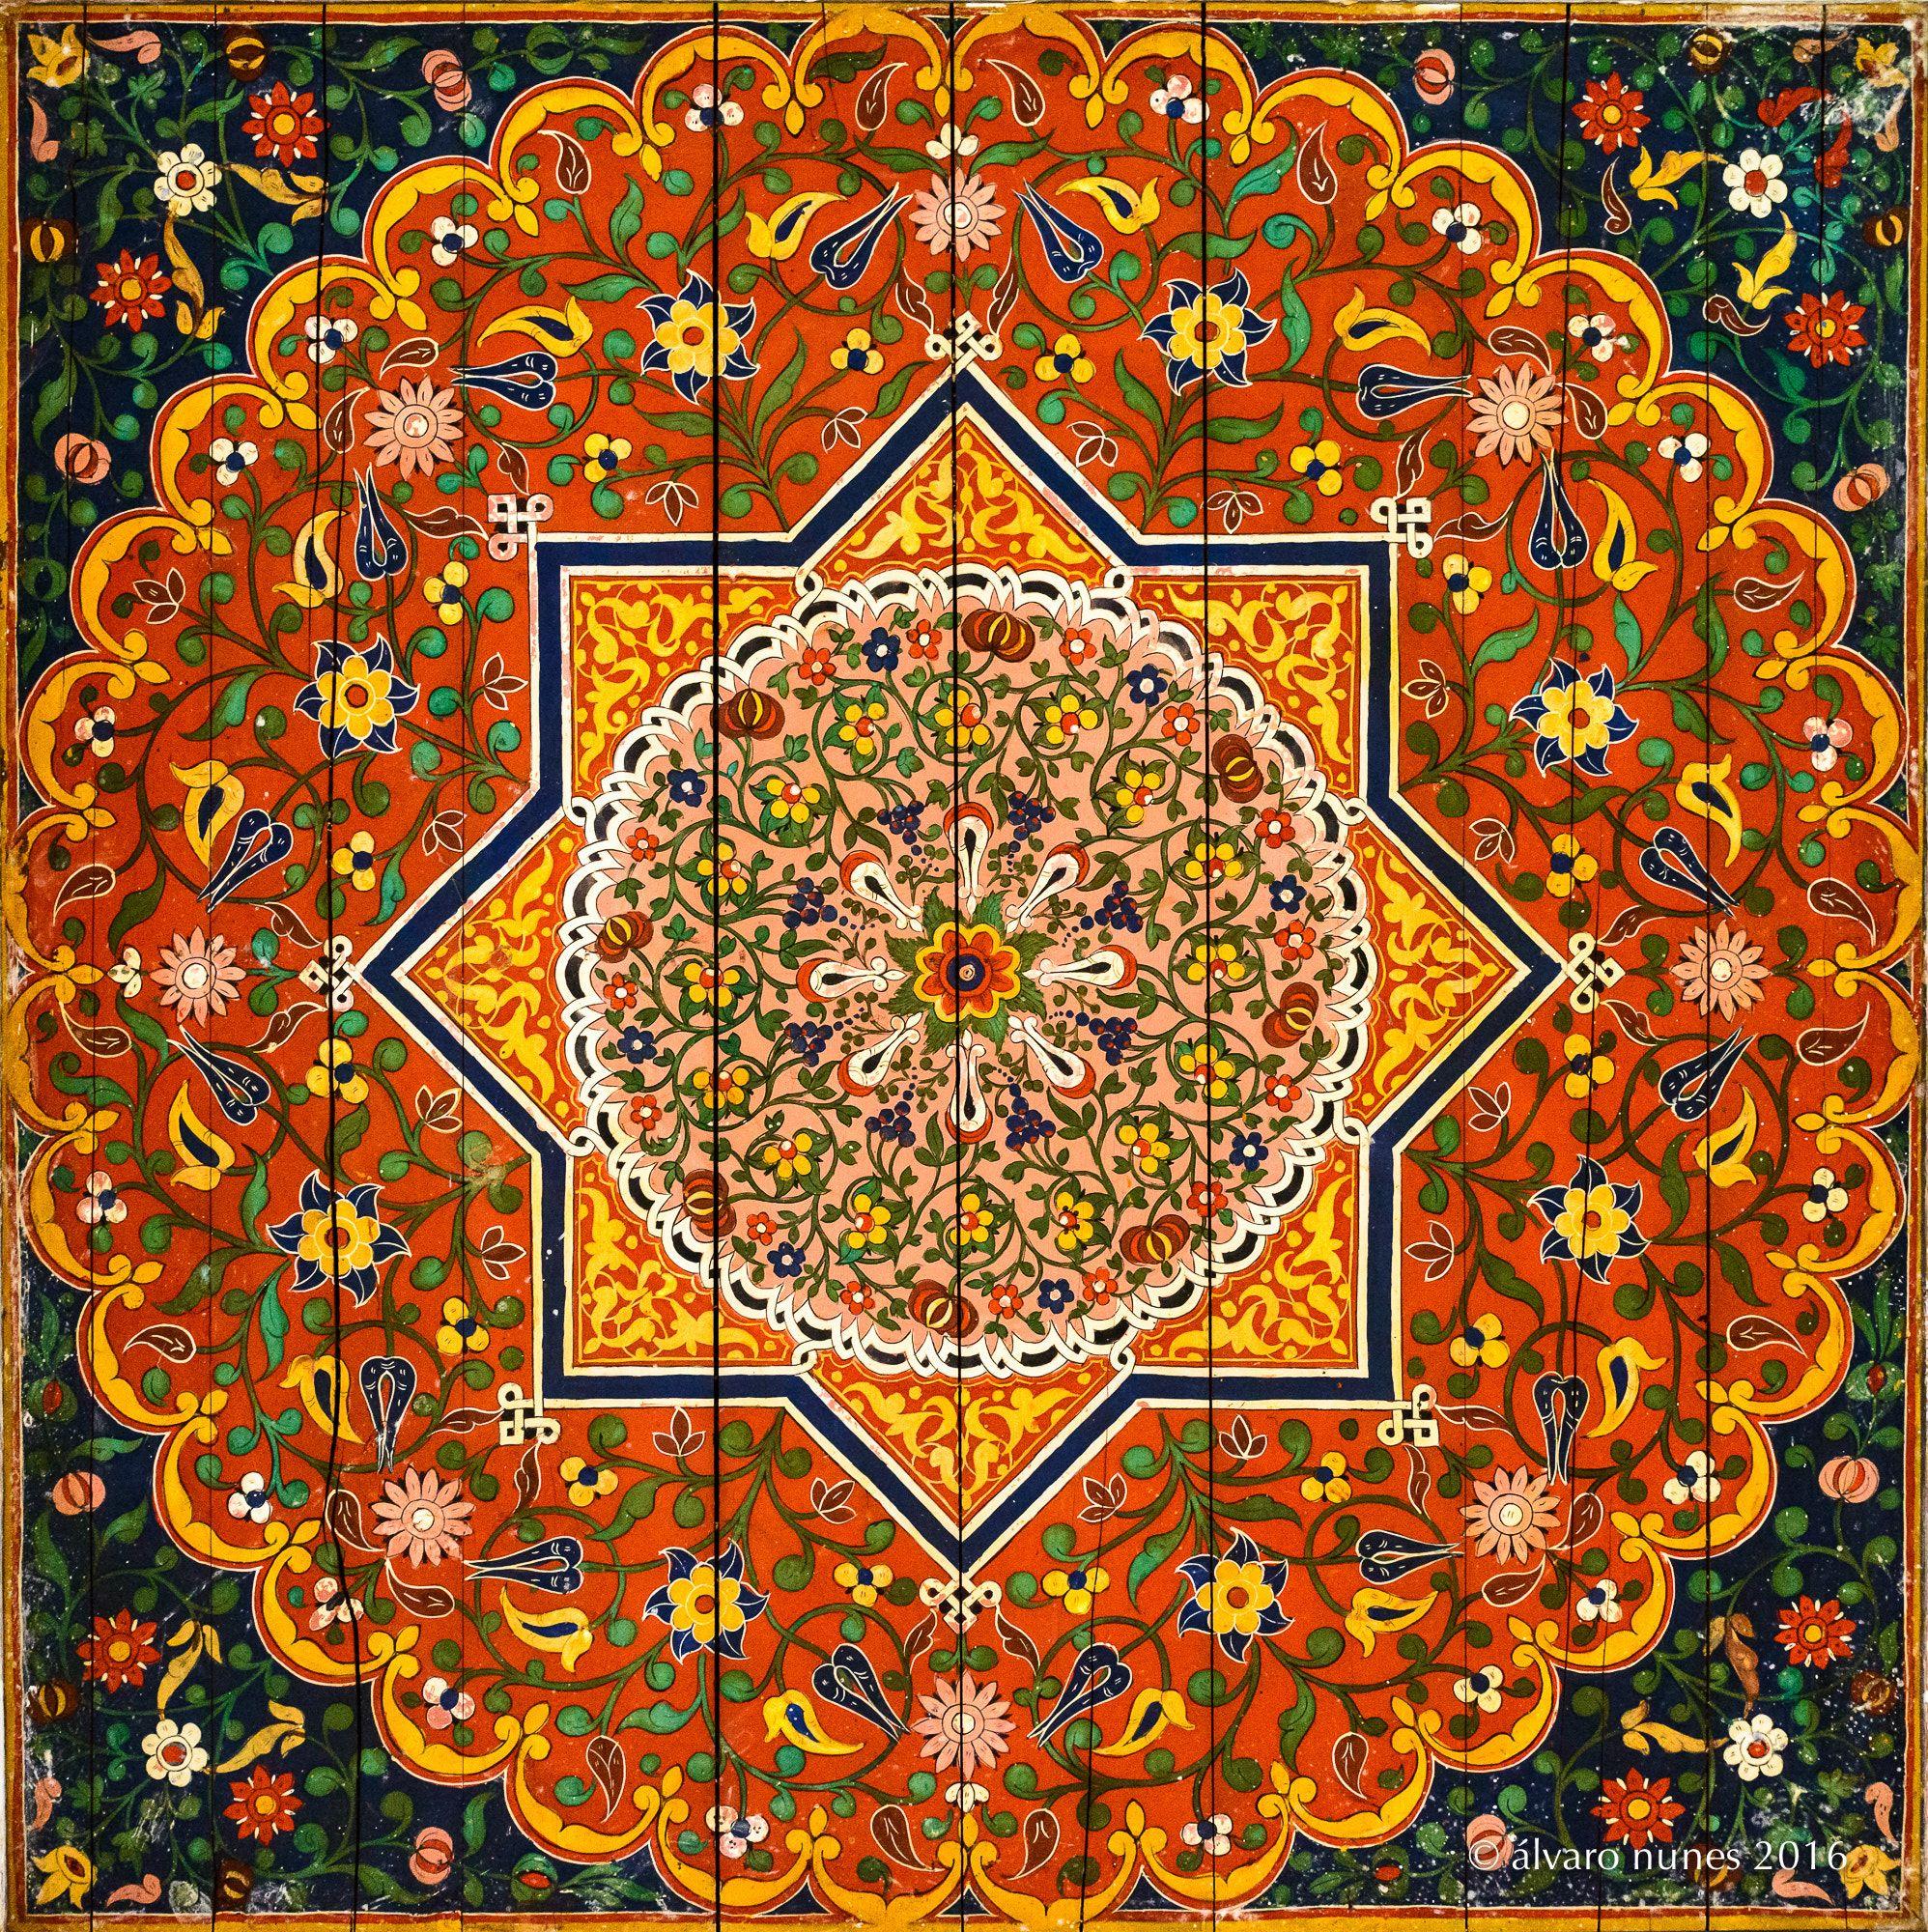 Painting in the ceiling | Menara gardens - Marraquesh Morocco ...